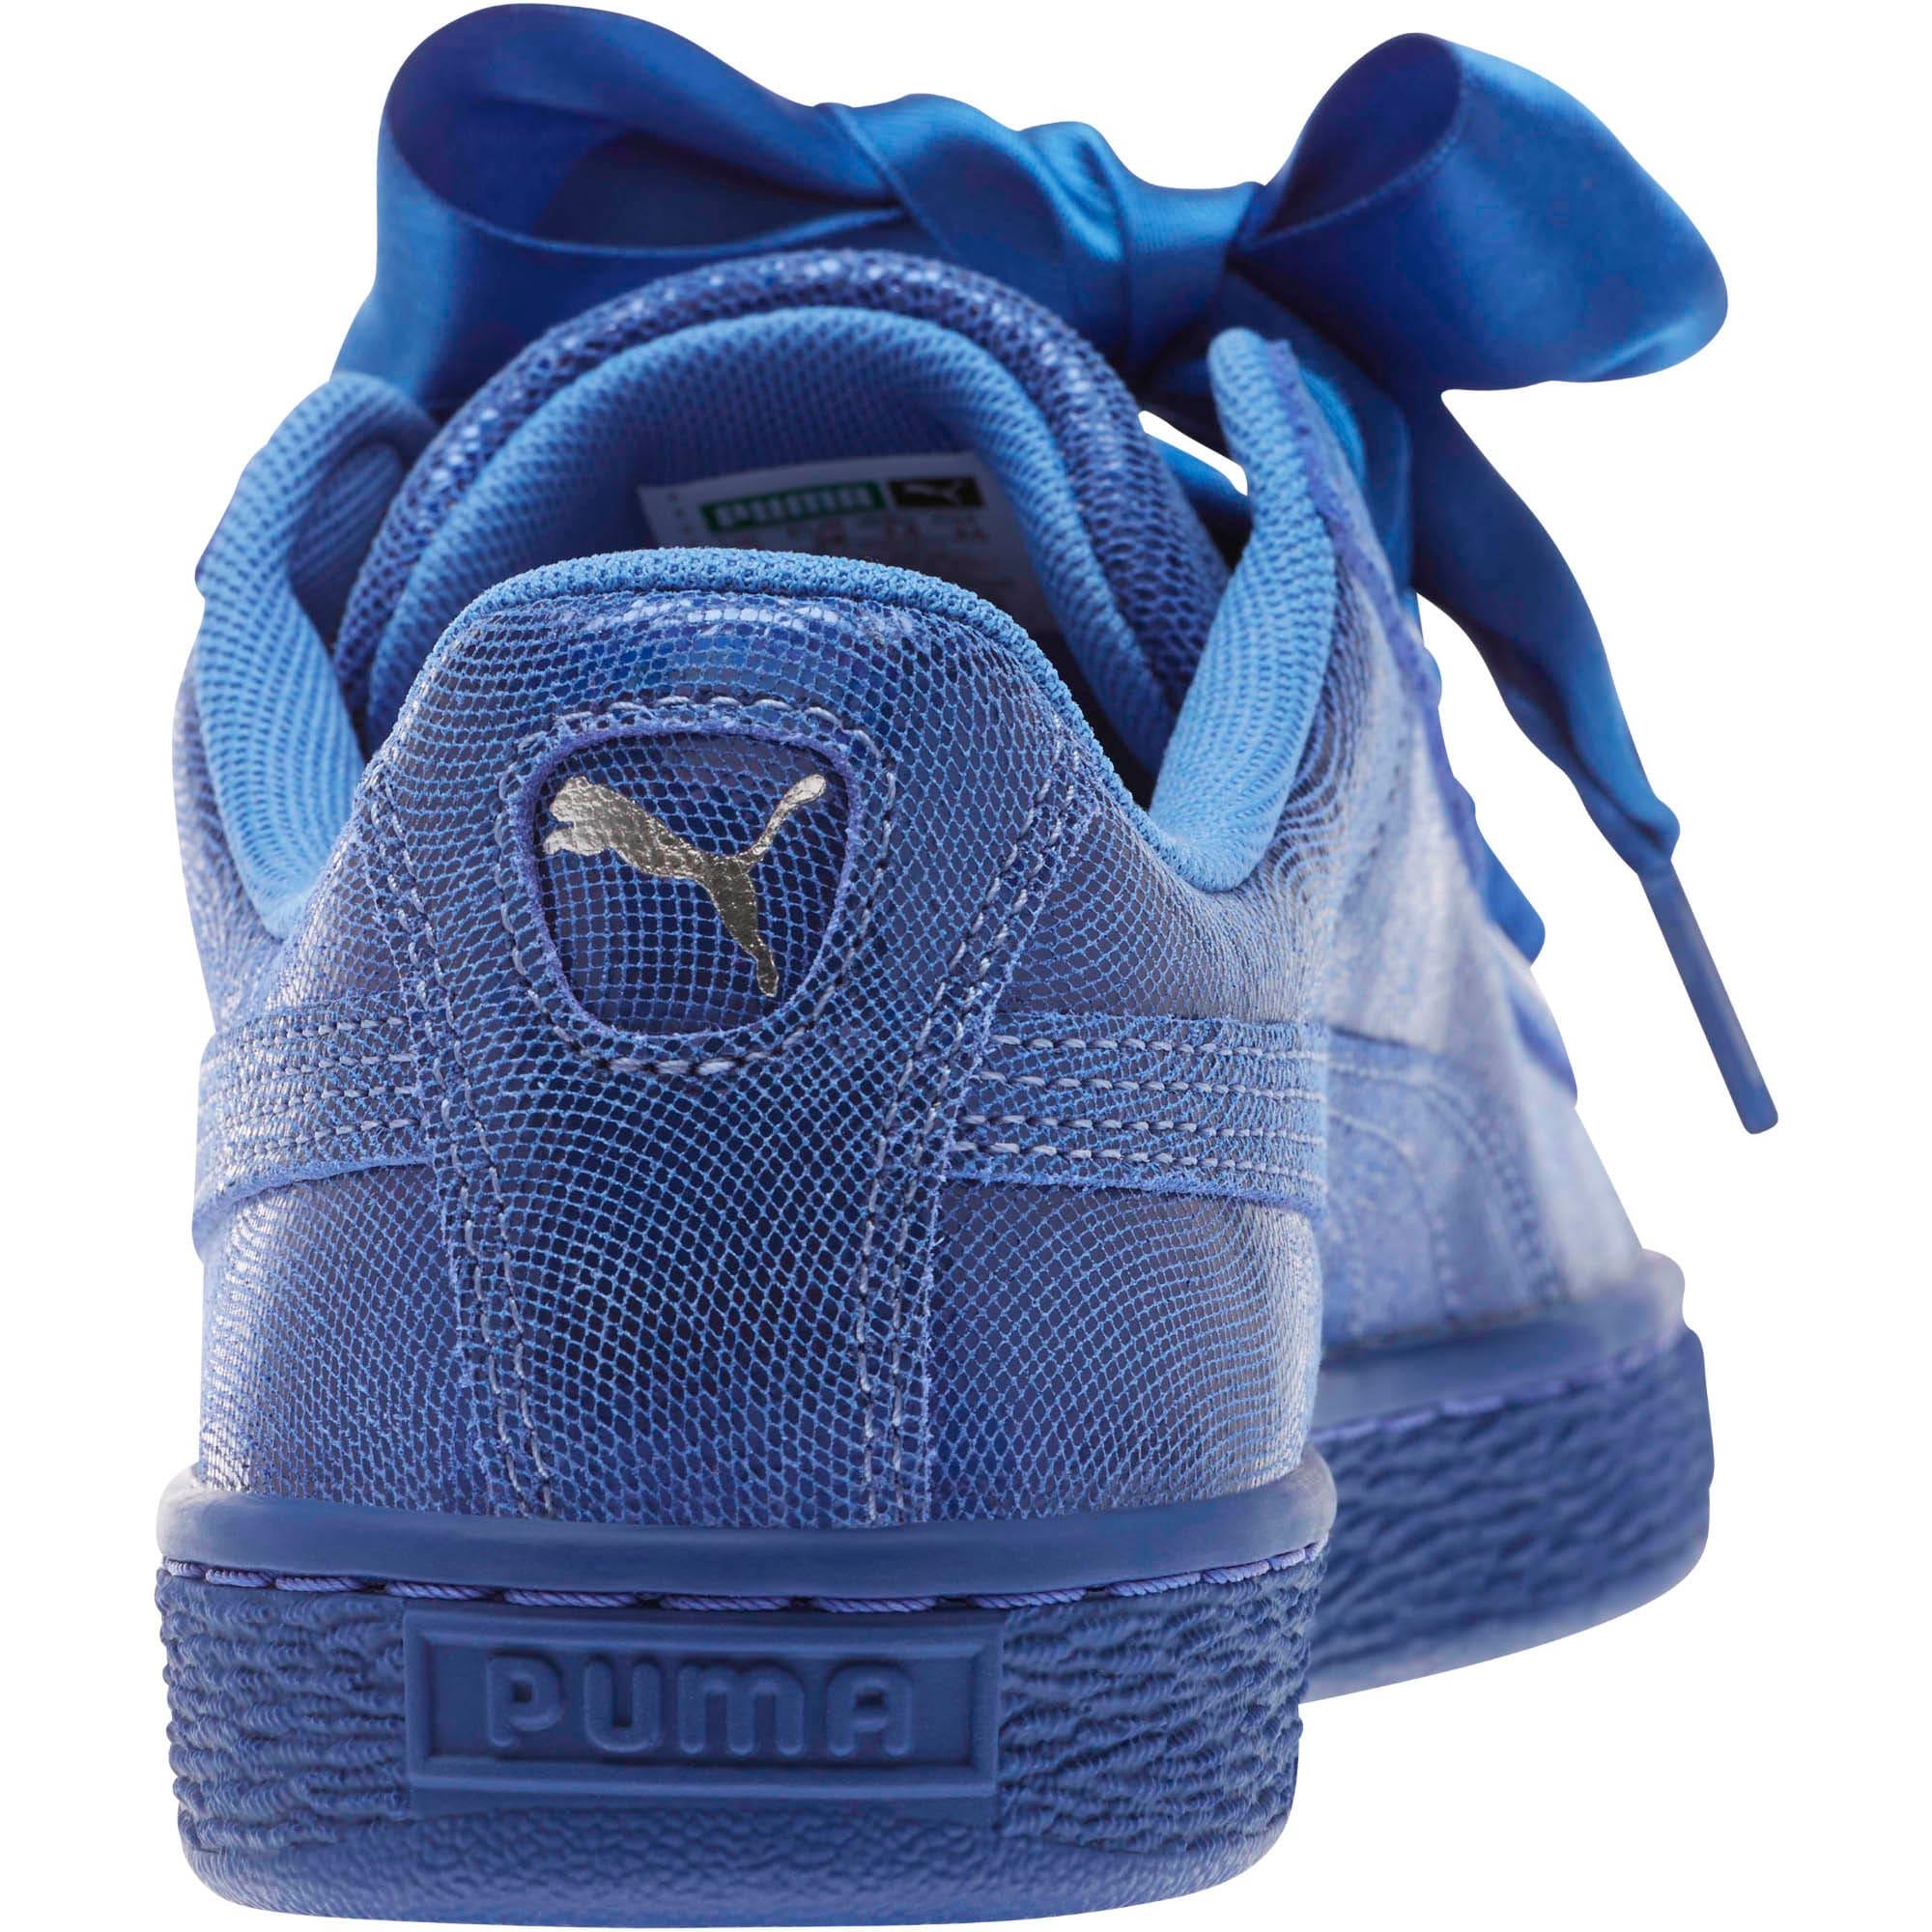 Thumbnail 4 of Basket Heart Opulence Women's Sneakers, Baja Blue-Baja Blue, medium